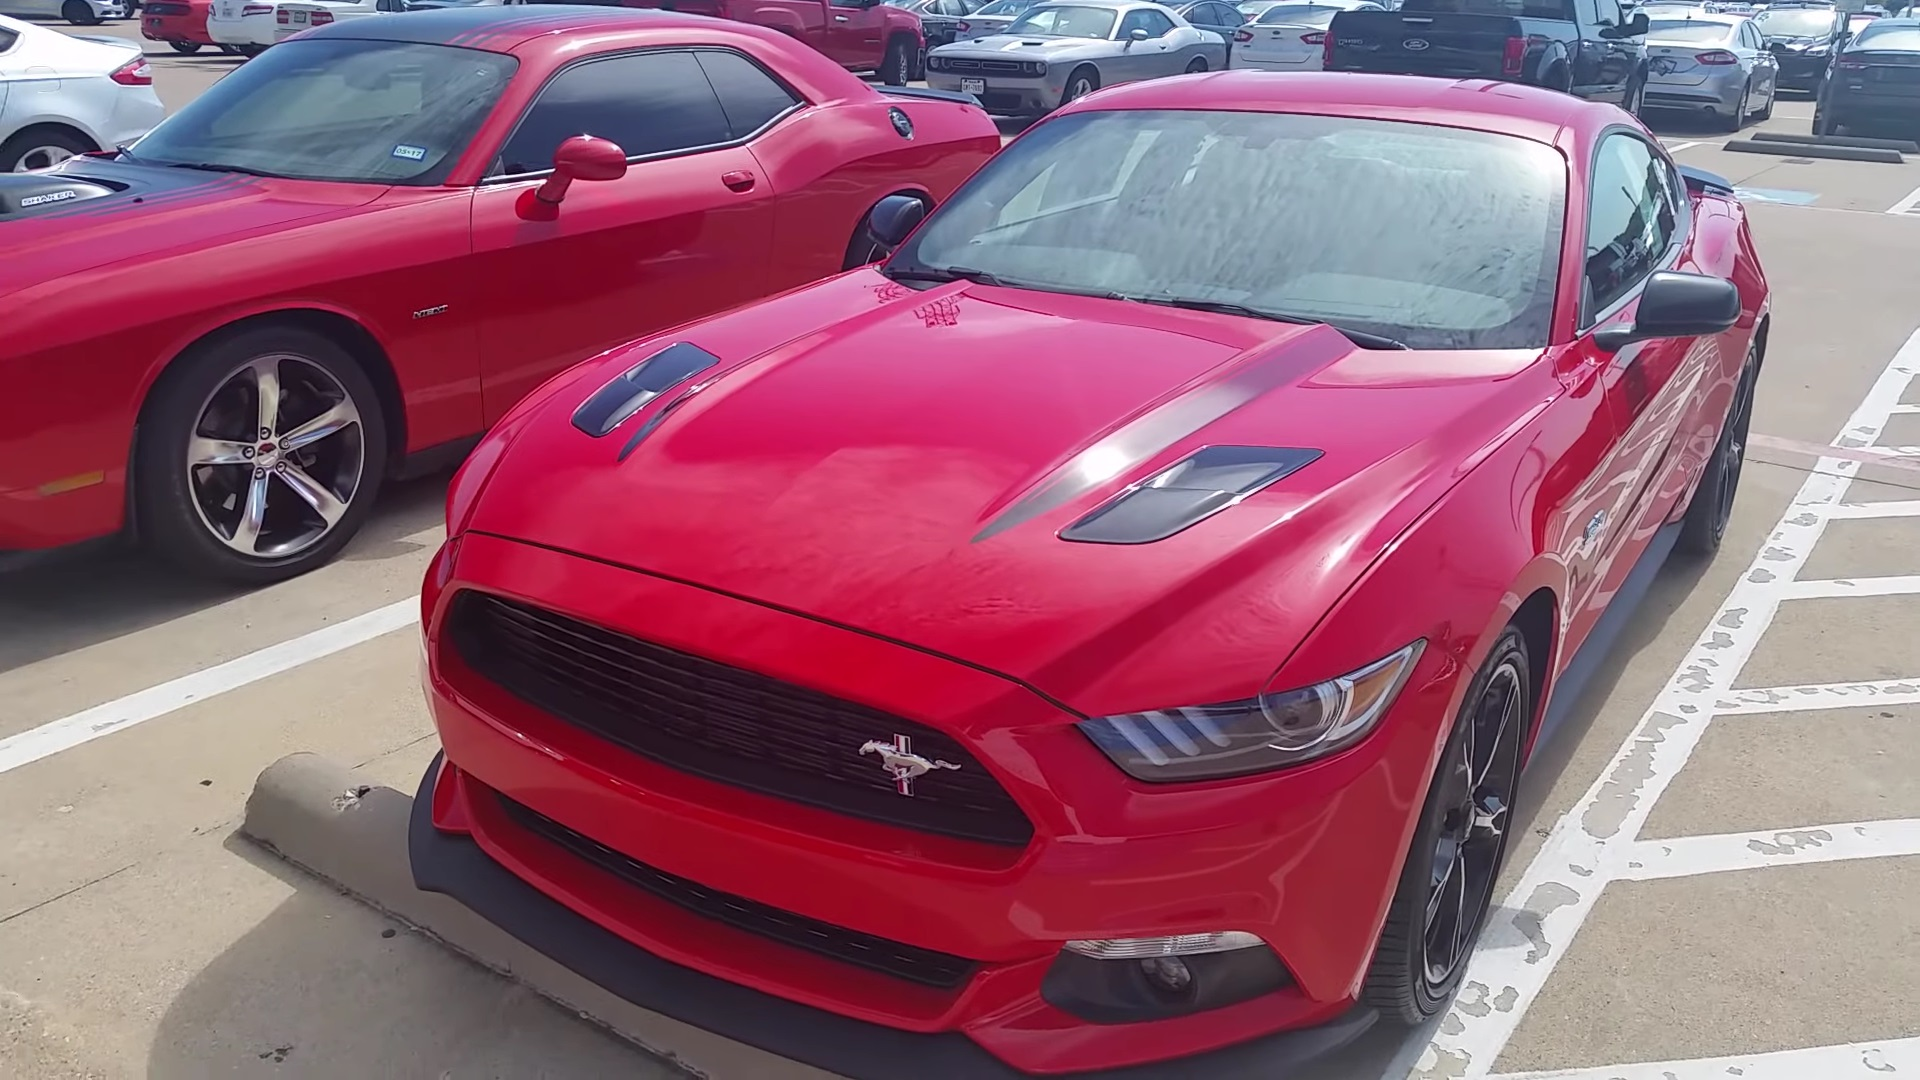 Video: 2017 Ford Mustang GT/CS California Special In-Depth Look